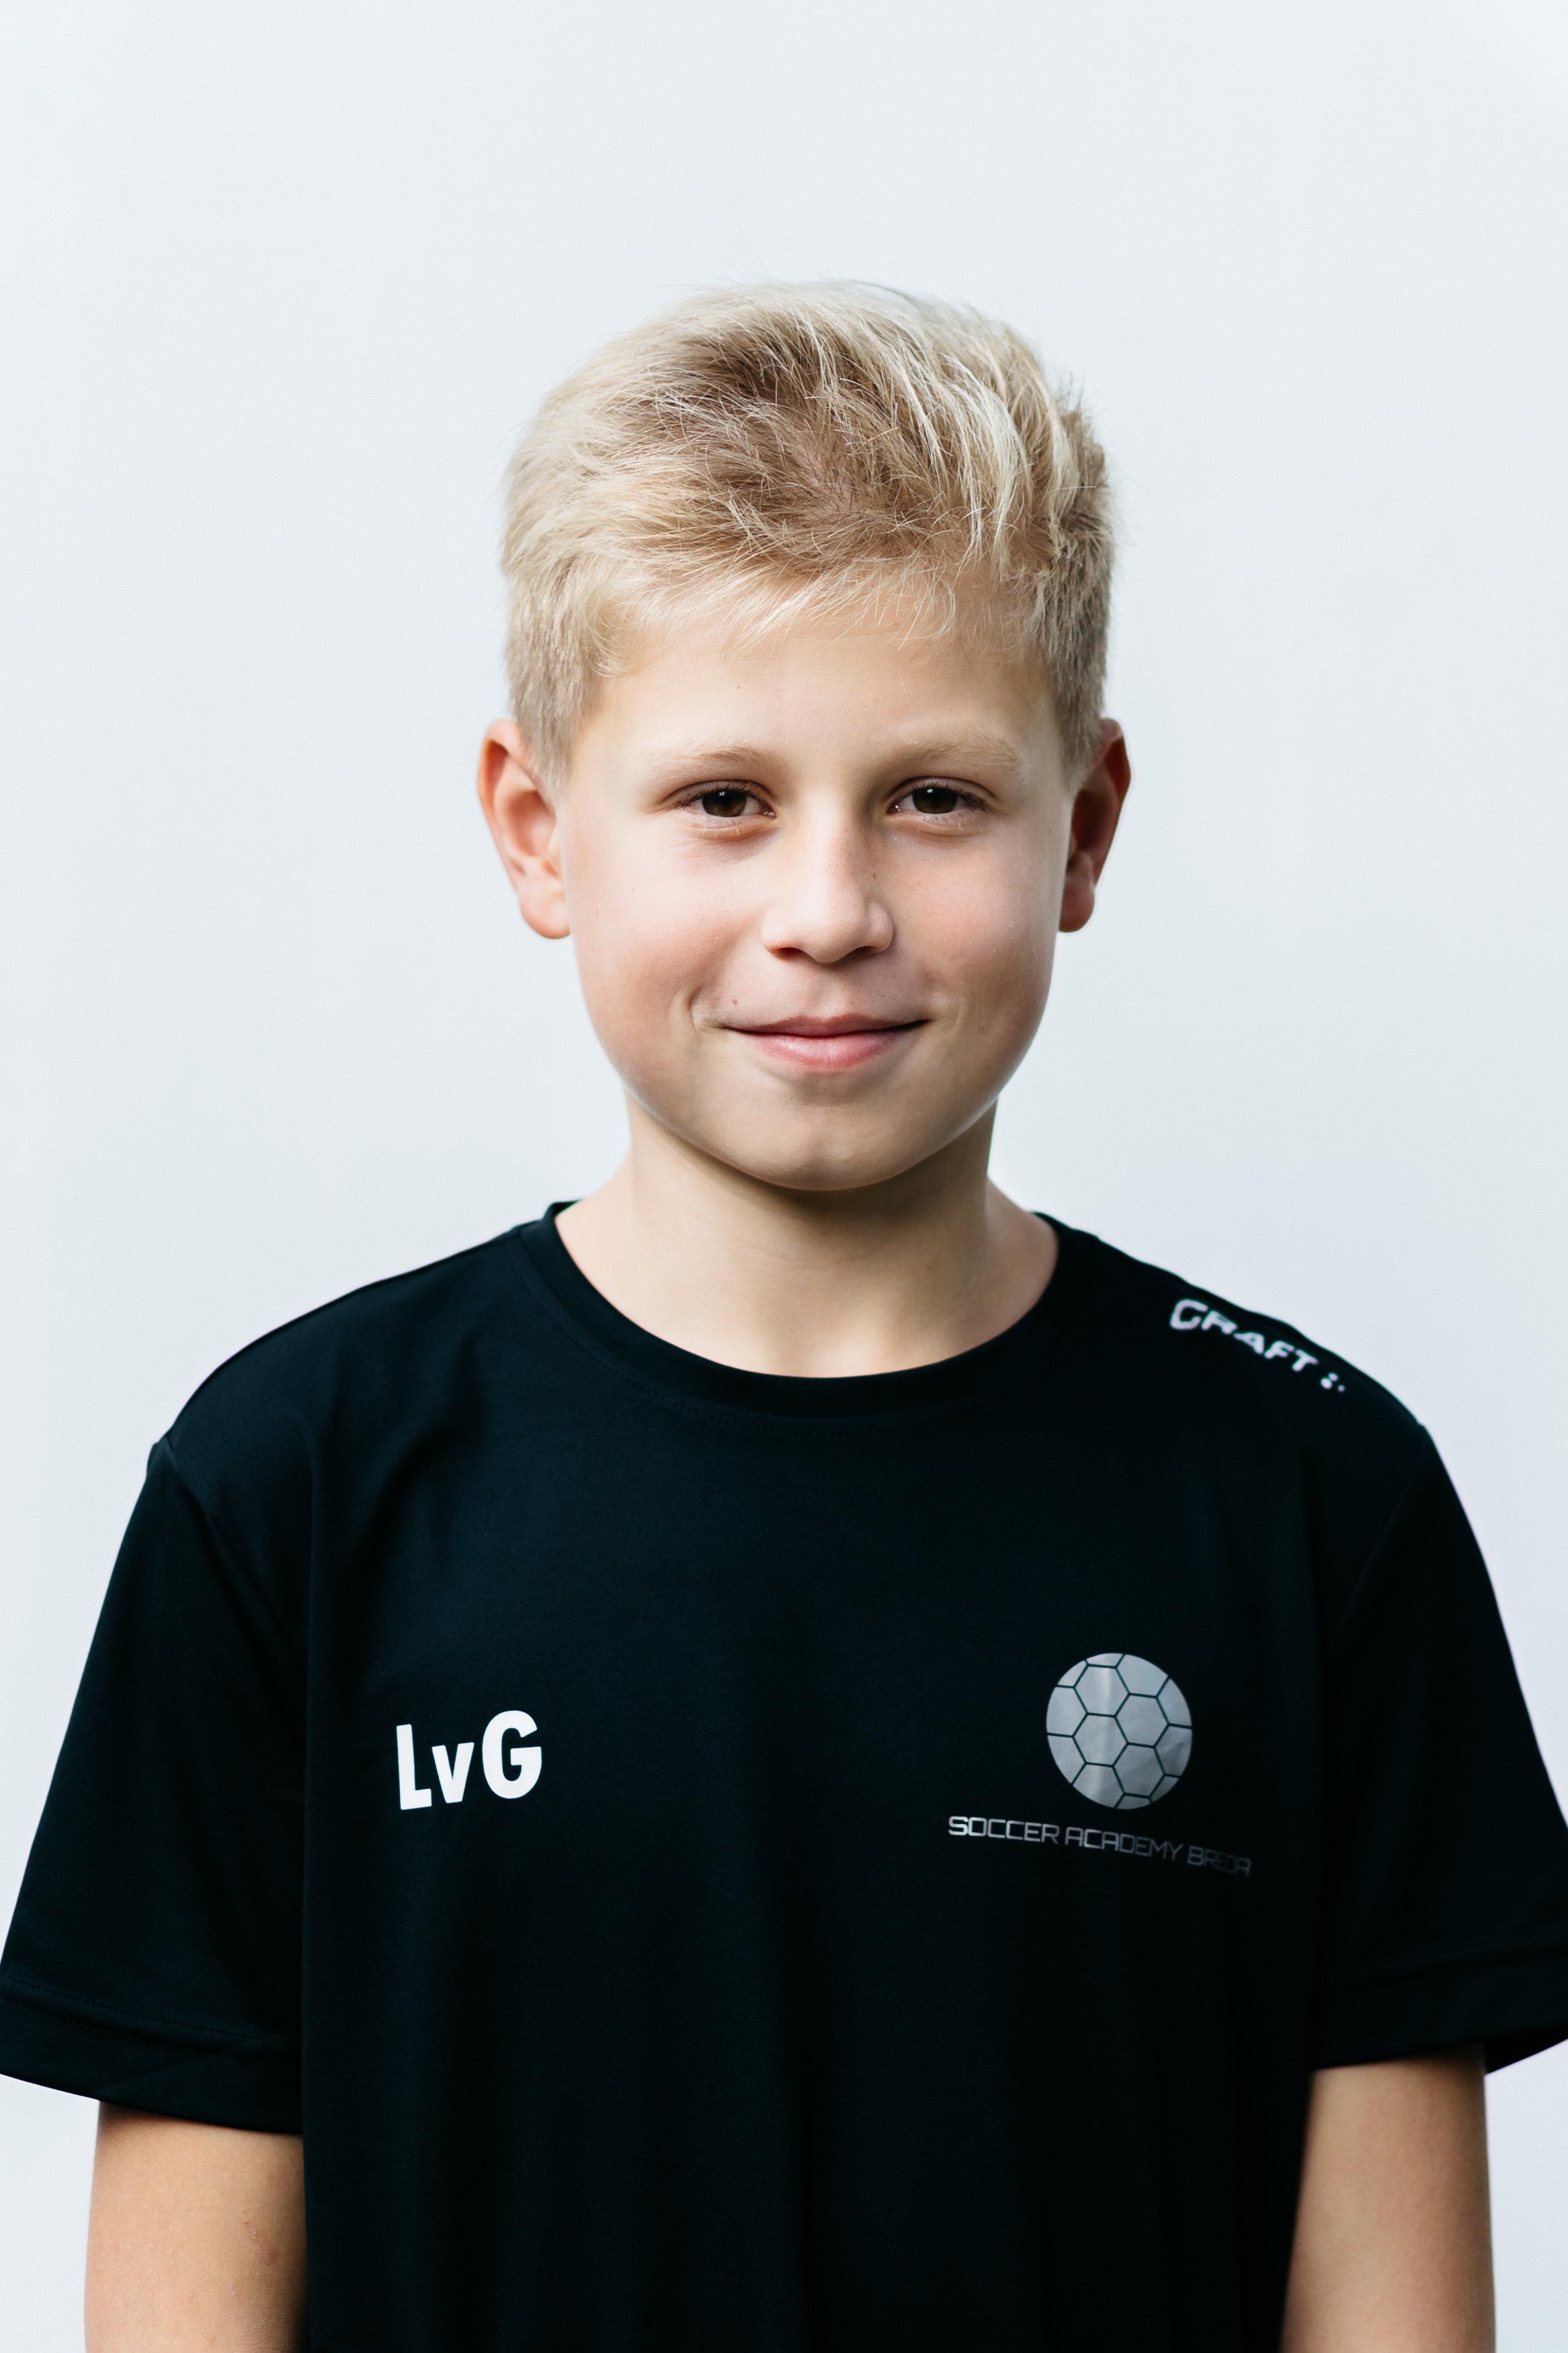 https://socceracademybreda.nl/wp-content/uploads/2020/10/luuk-van-gemert-teampagina.jpg